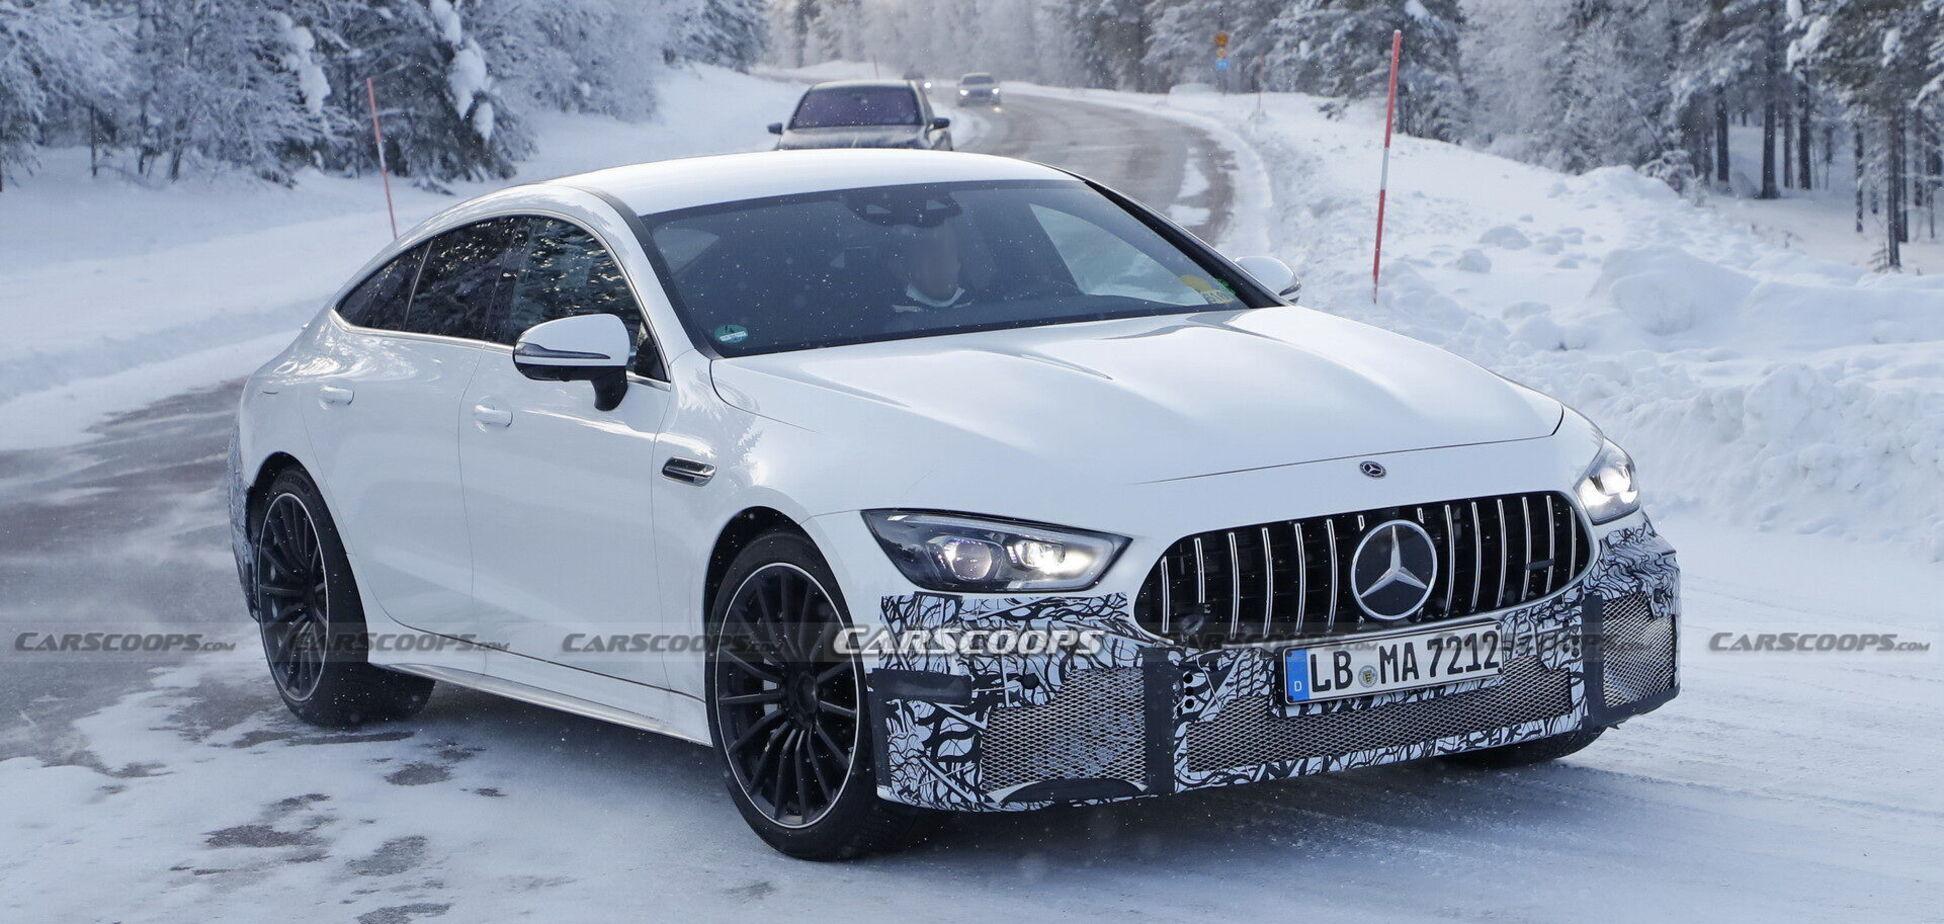 Mercedes-AMG GT 73e PHEV станет самым мощным в истории марки